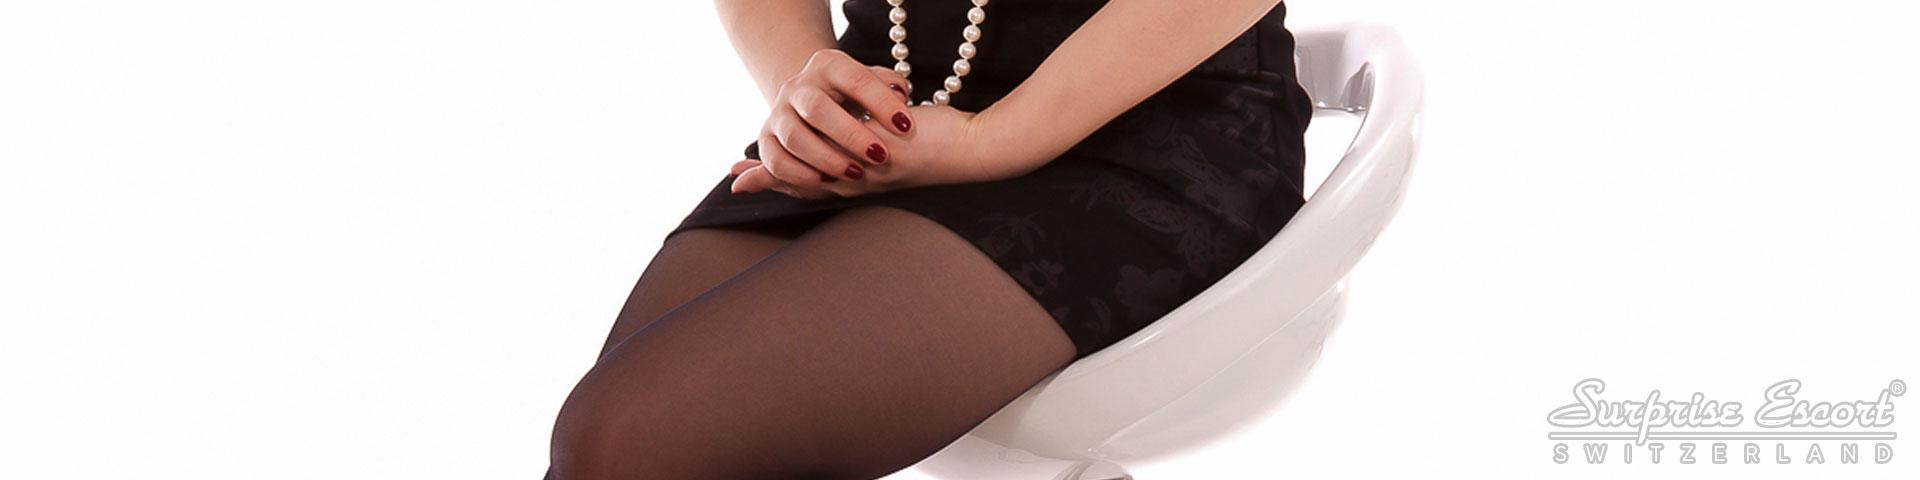 erotische massage in antwerpen erotische massage merksem